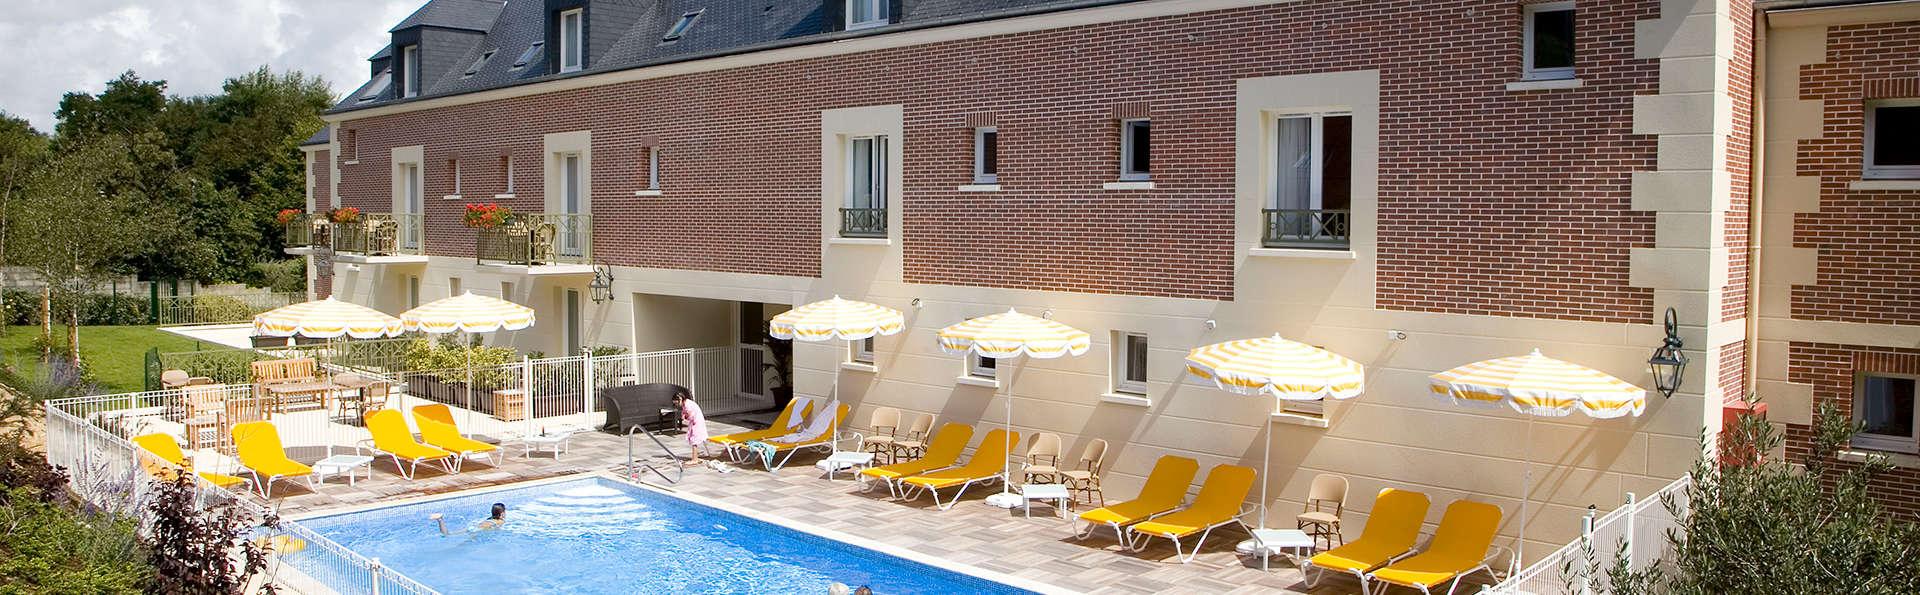 Tulip Inn Residence Honfleur  - edit_pool.jpg